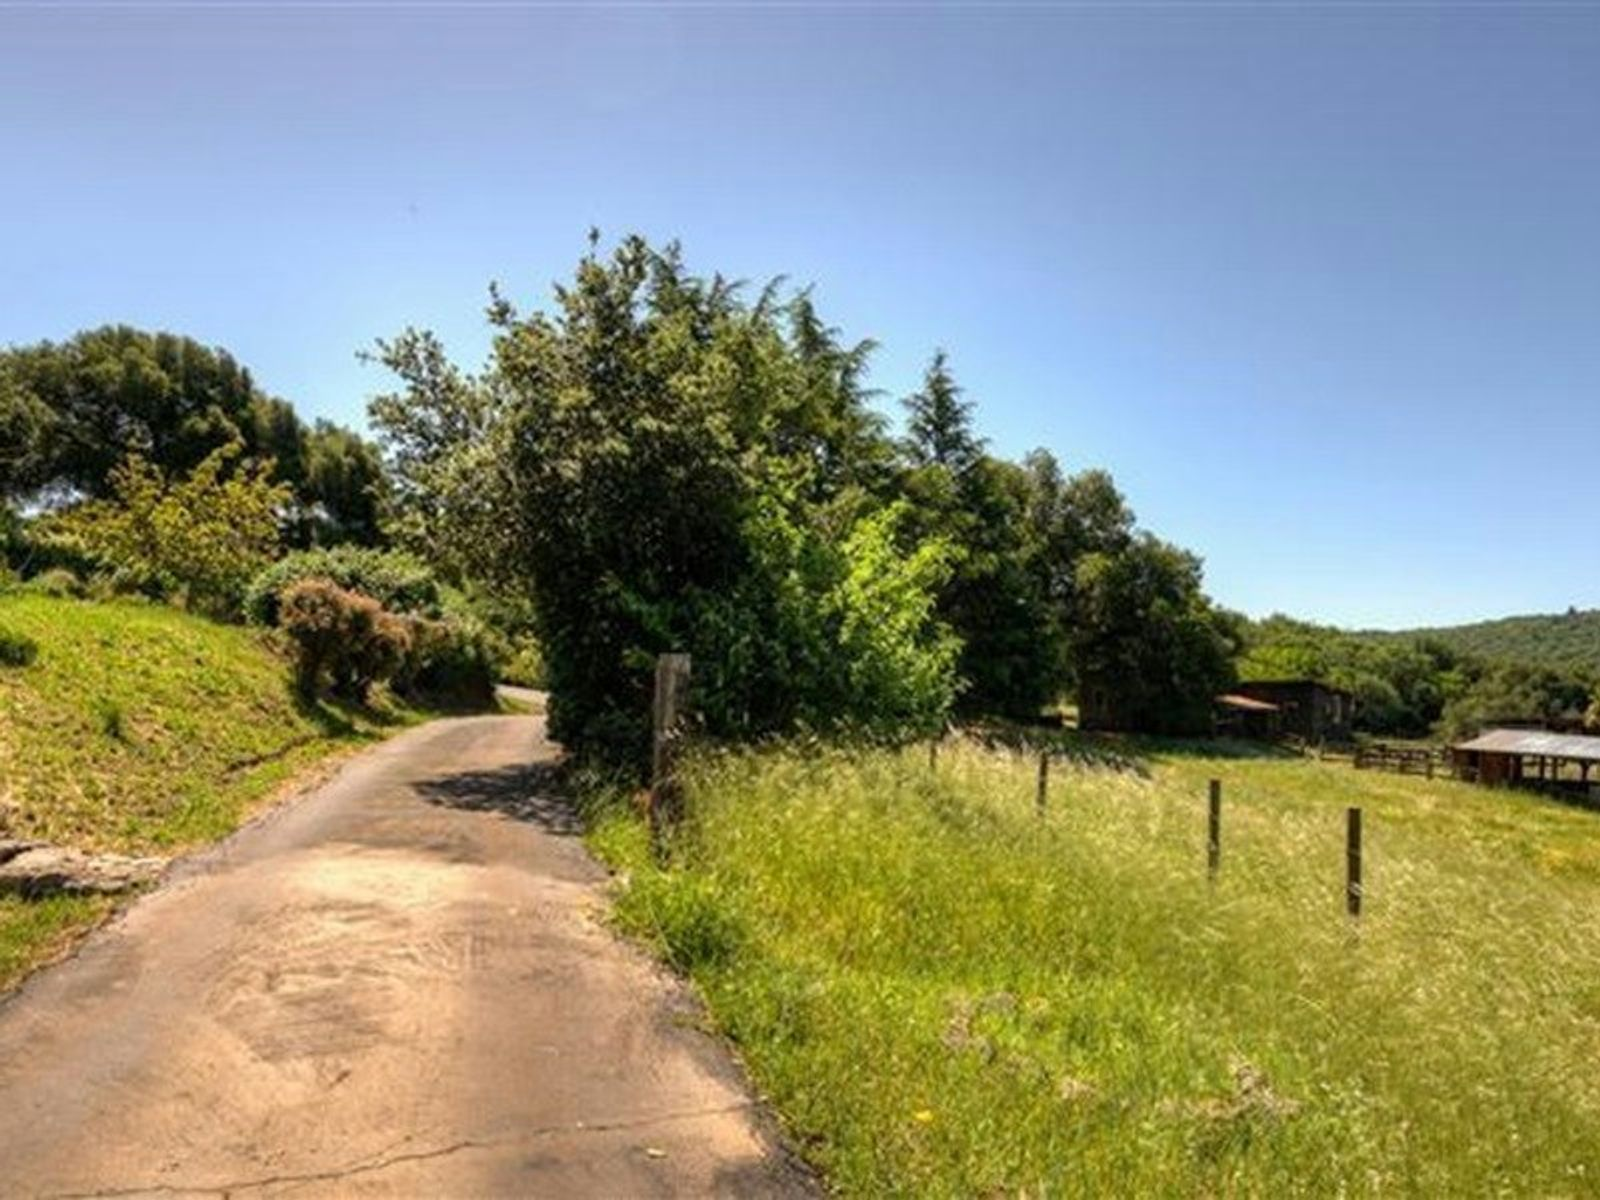 Exquisite Lovall Valley Loop Road